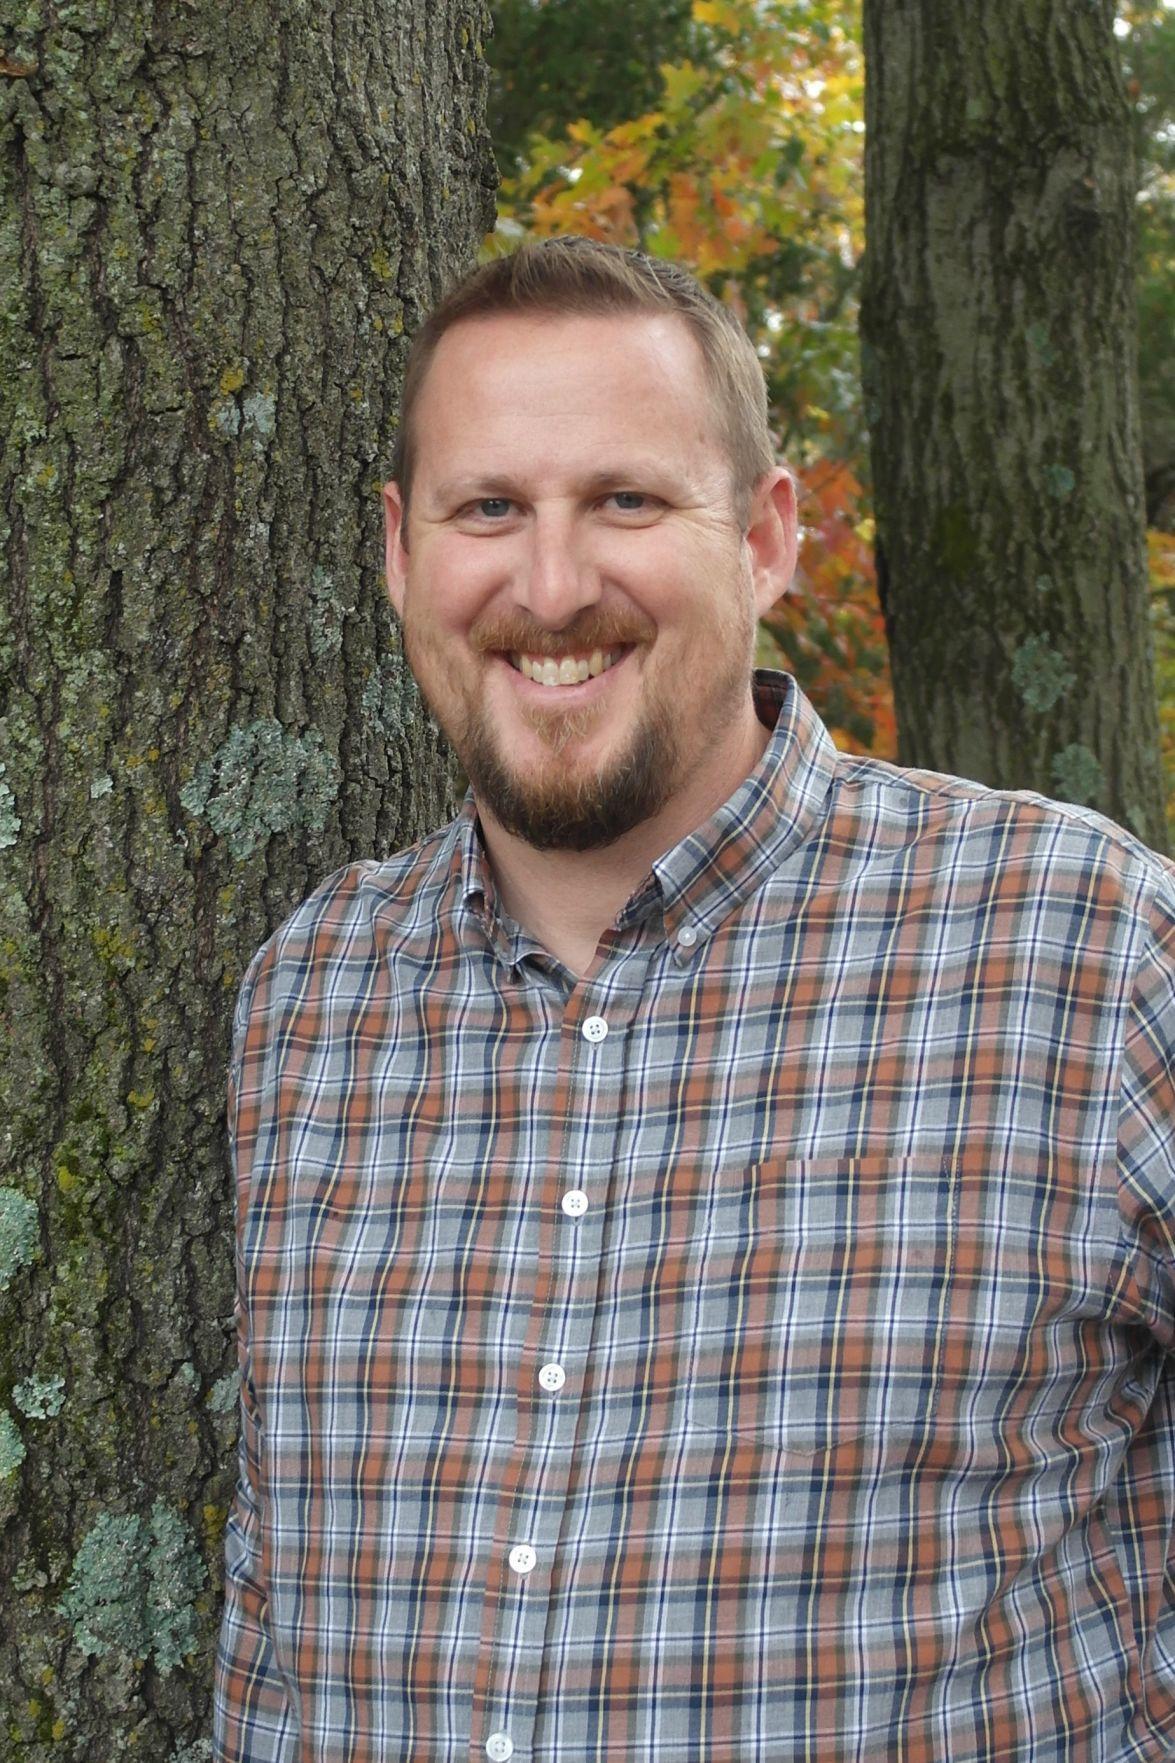 Todd Sampsell